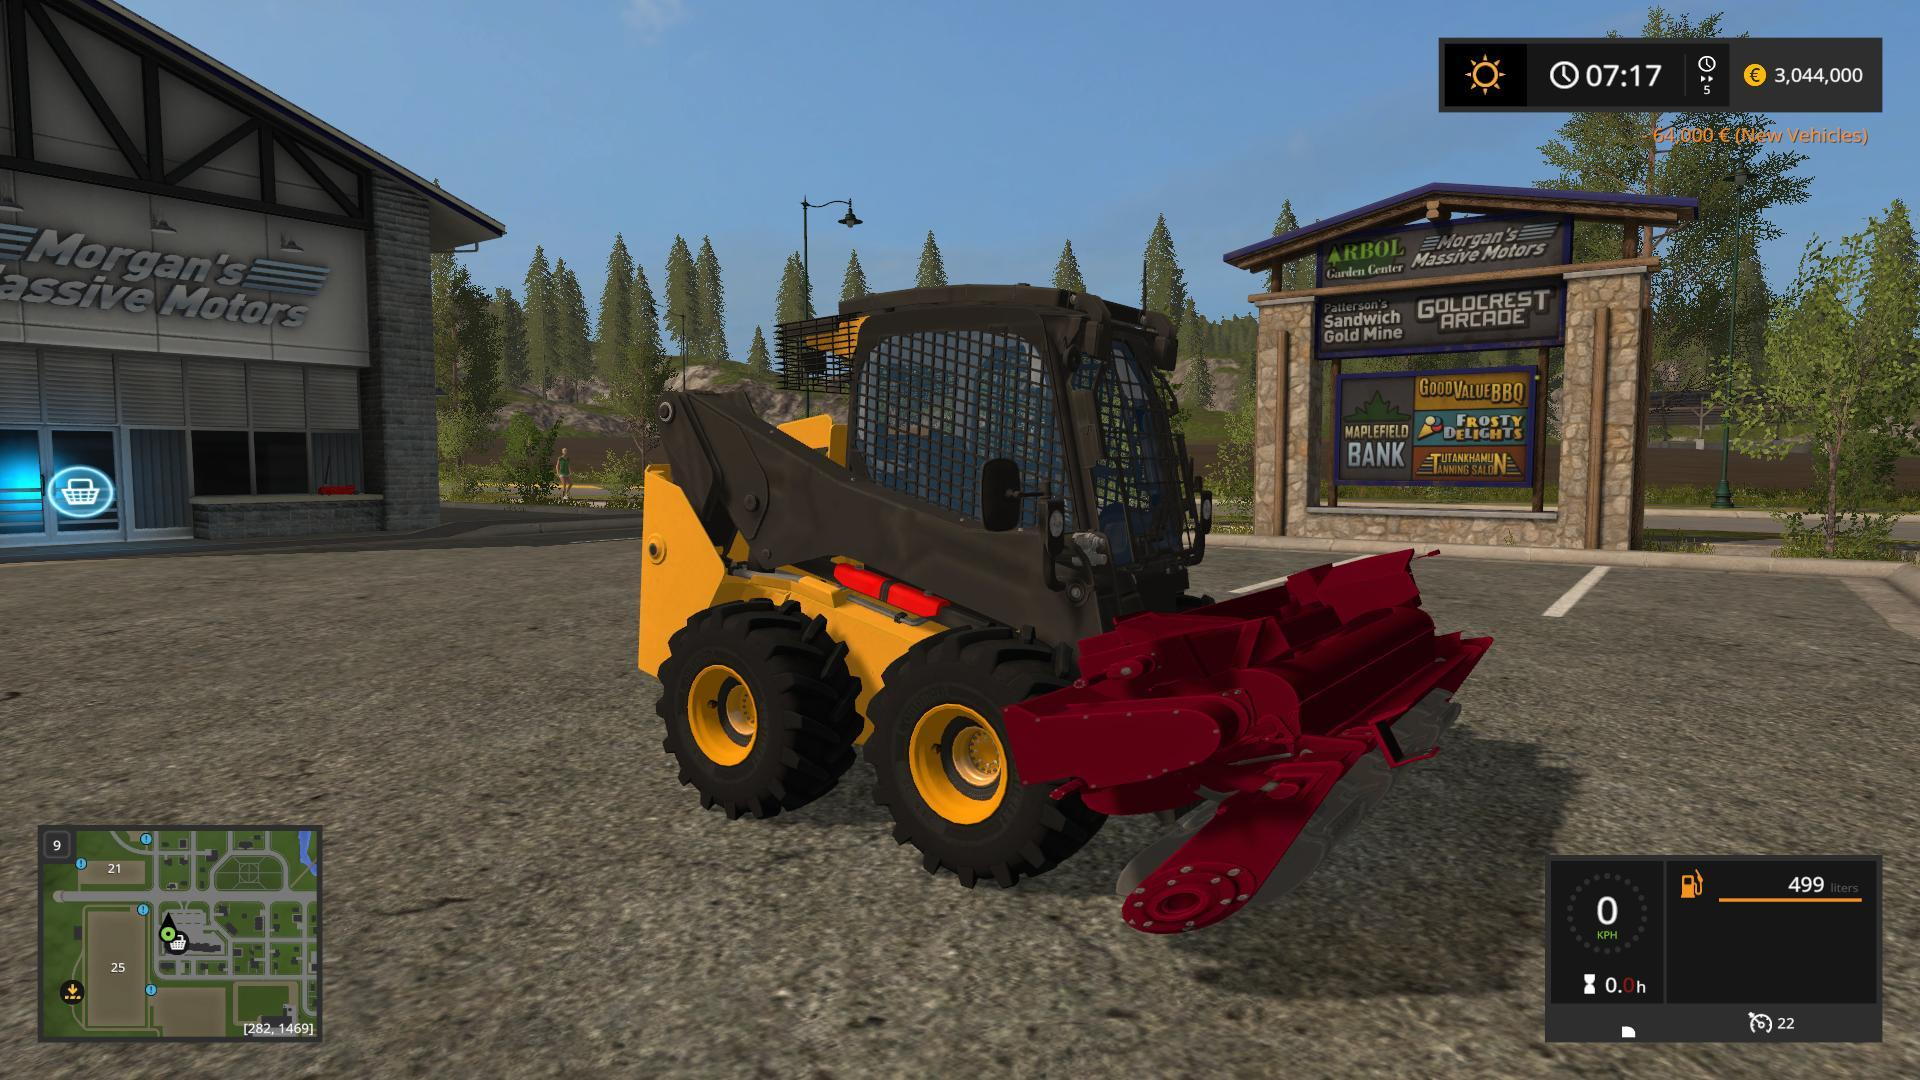 Fdr Chipper V1 0 Fs17 Farming Simulator 17 Mod Fs 2017 Mod